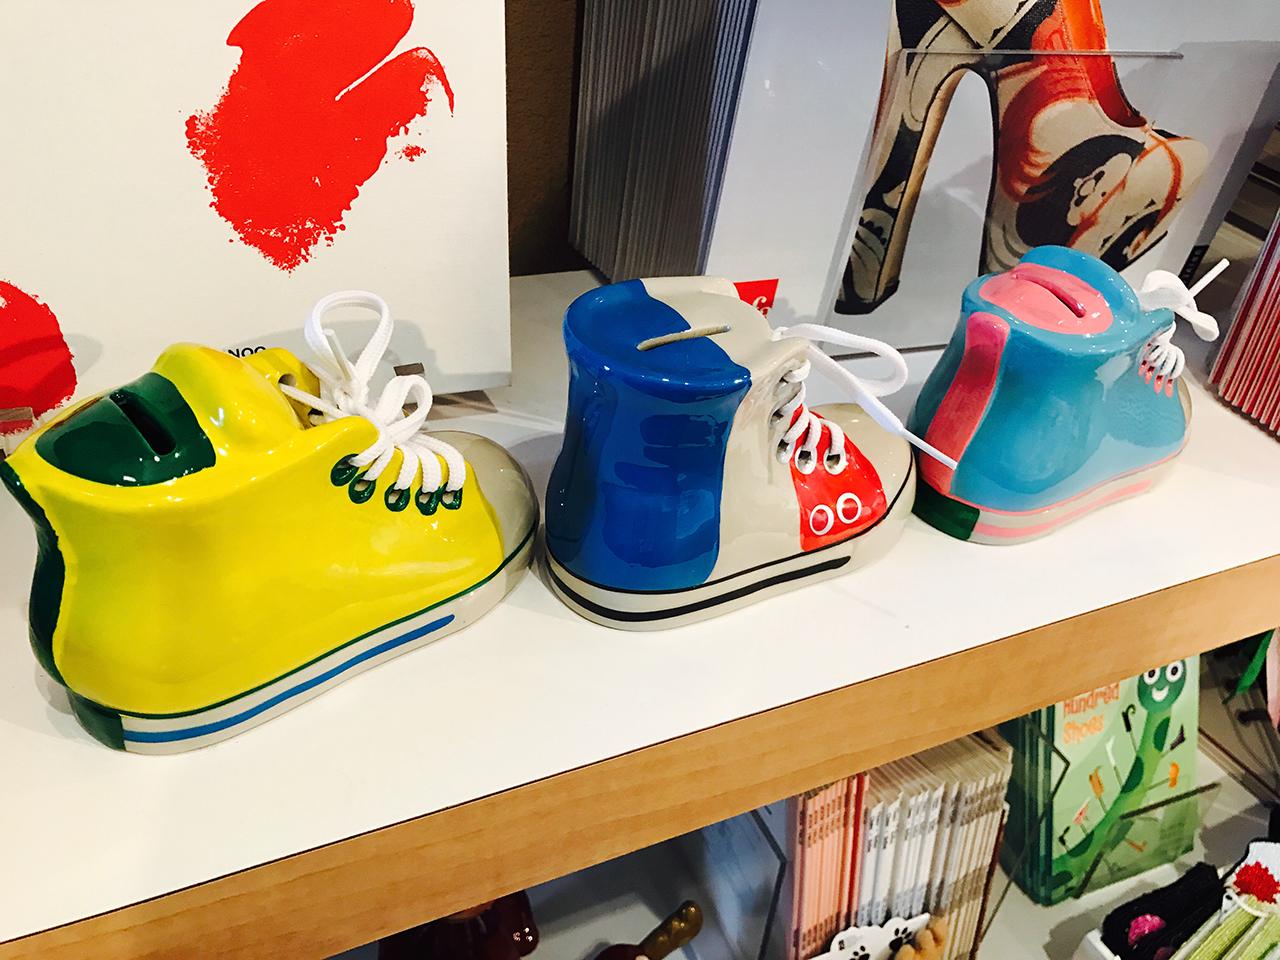 bata-shoe-museum-204